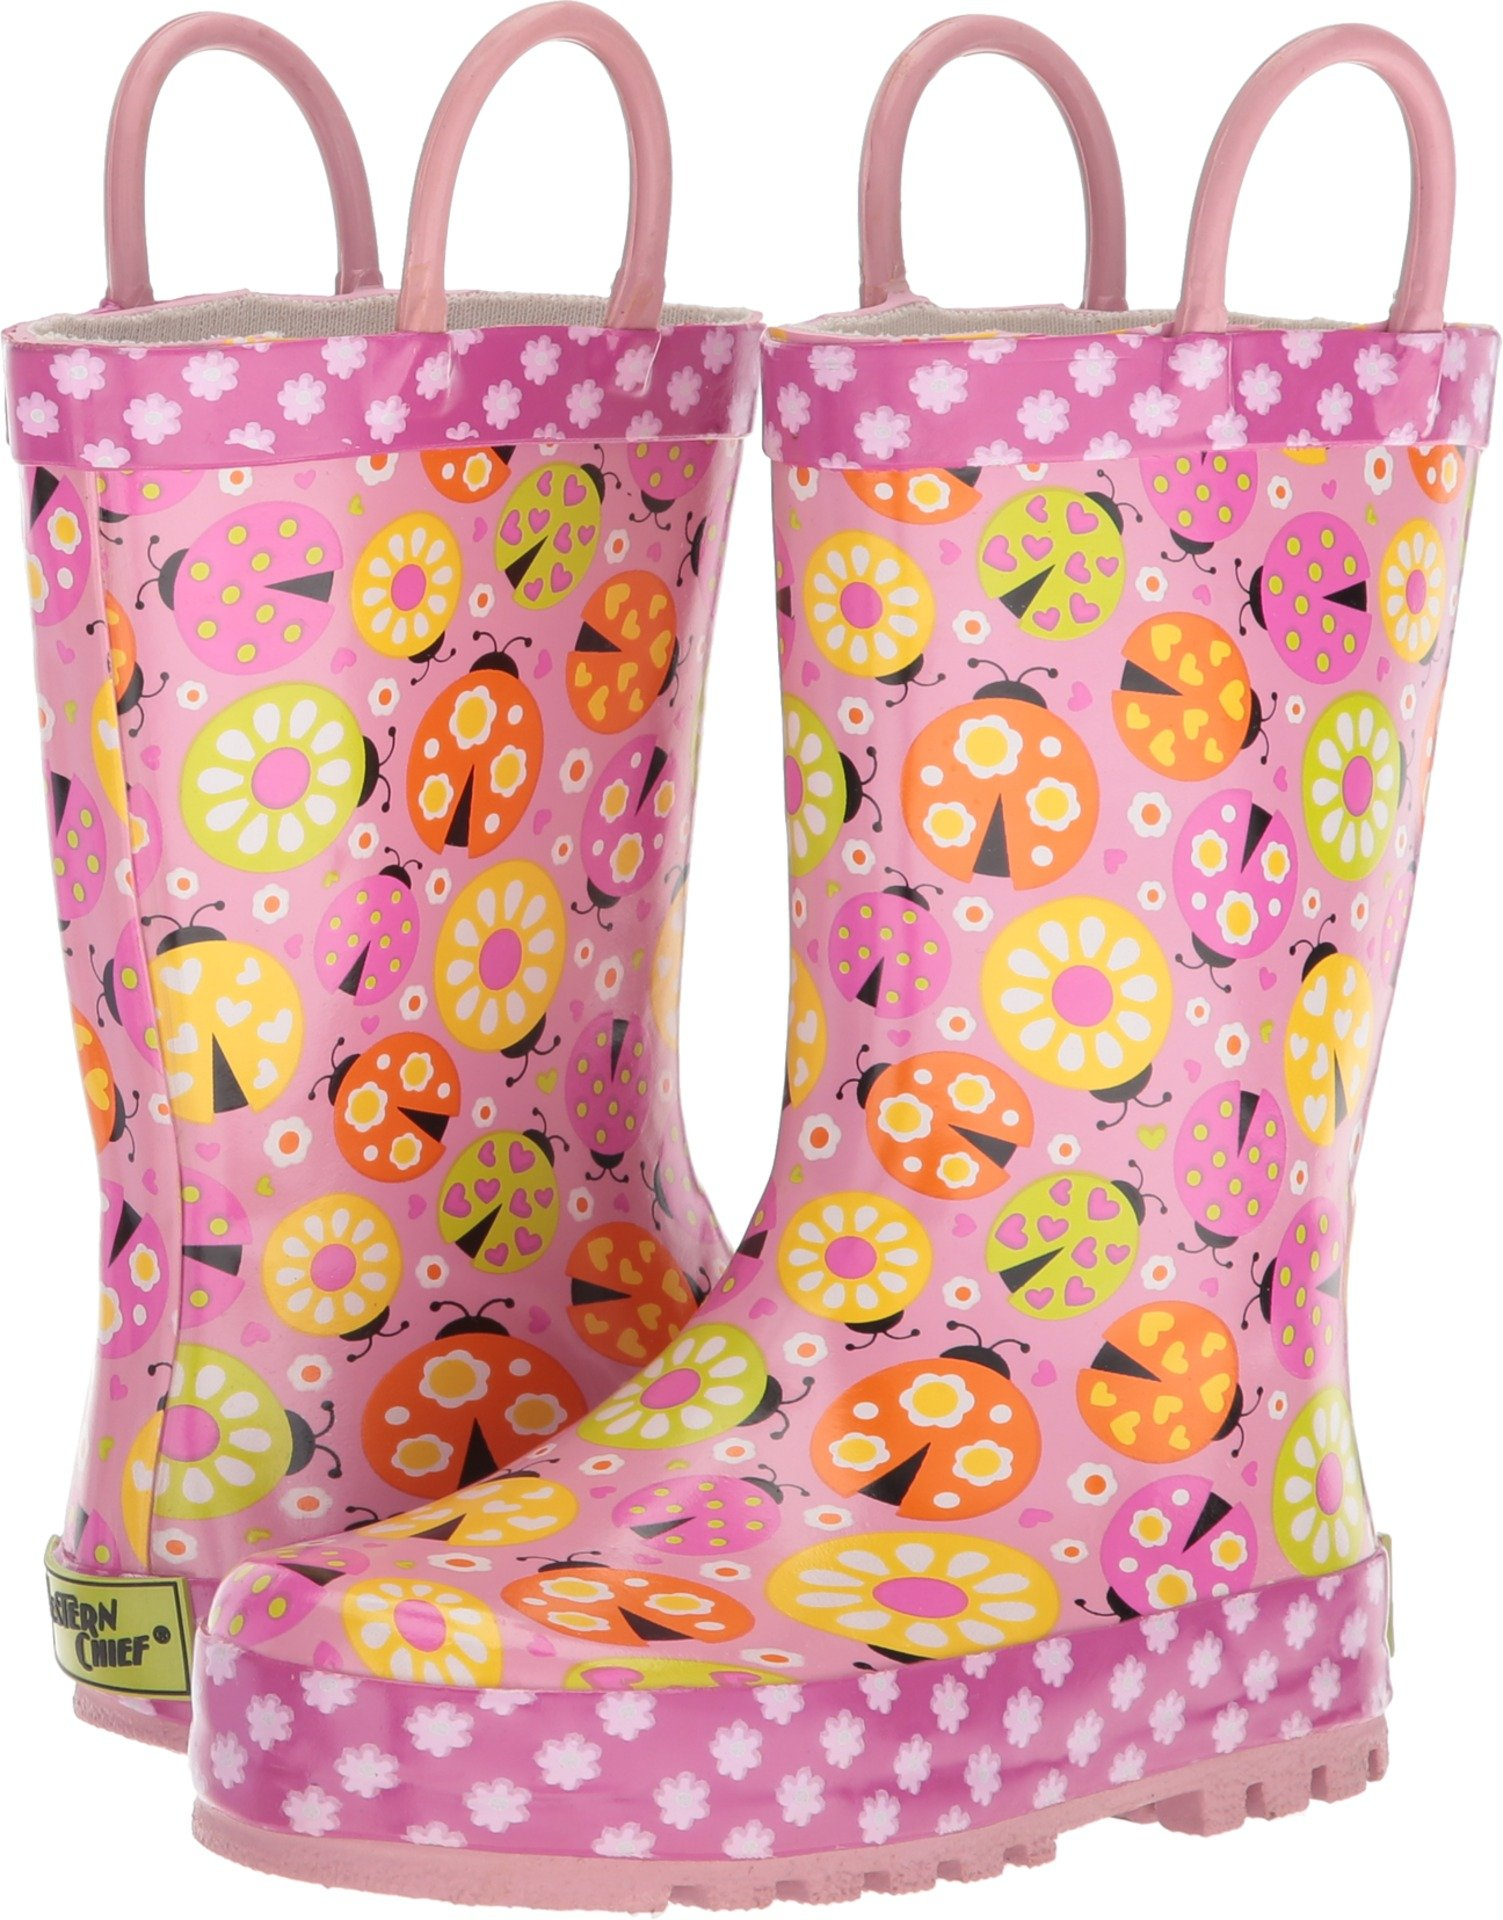 Western Chief Kids Ladybug Garden Rain Boot Pink 12 by Western Chief (Image #1)